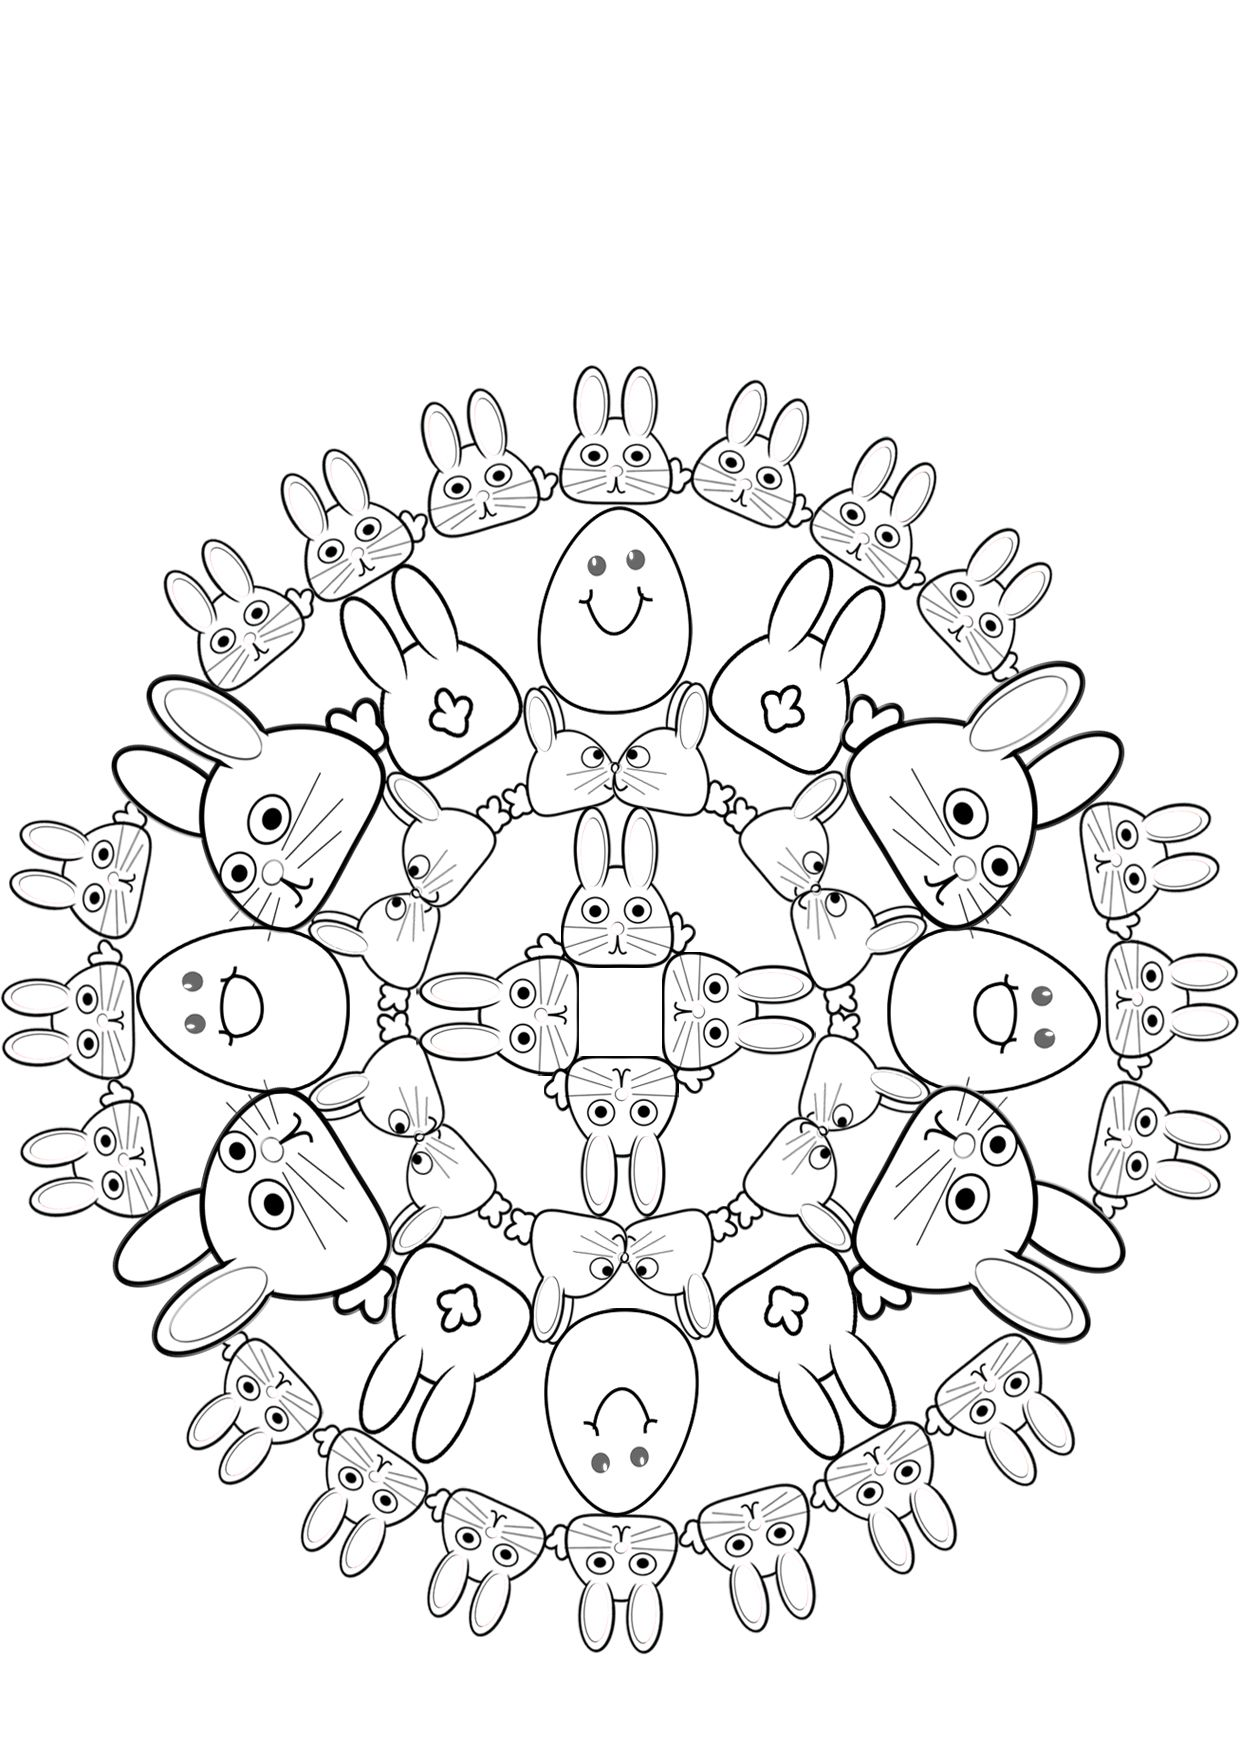 Bildergebnis für mandalas zum ausmalen pdf Mandala